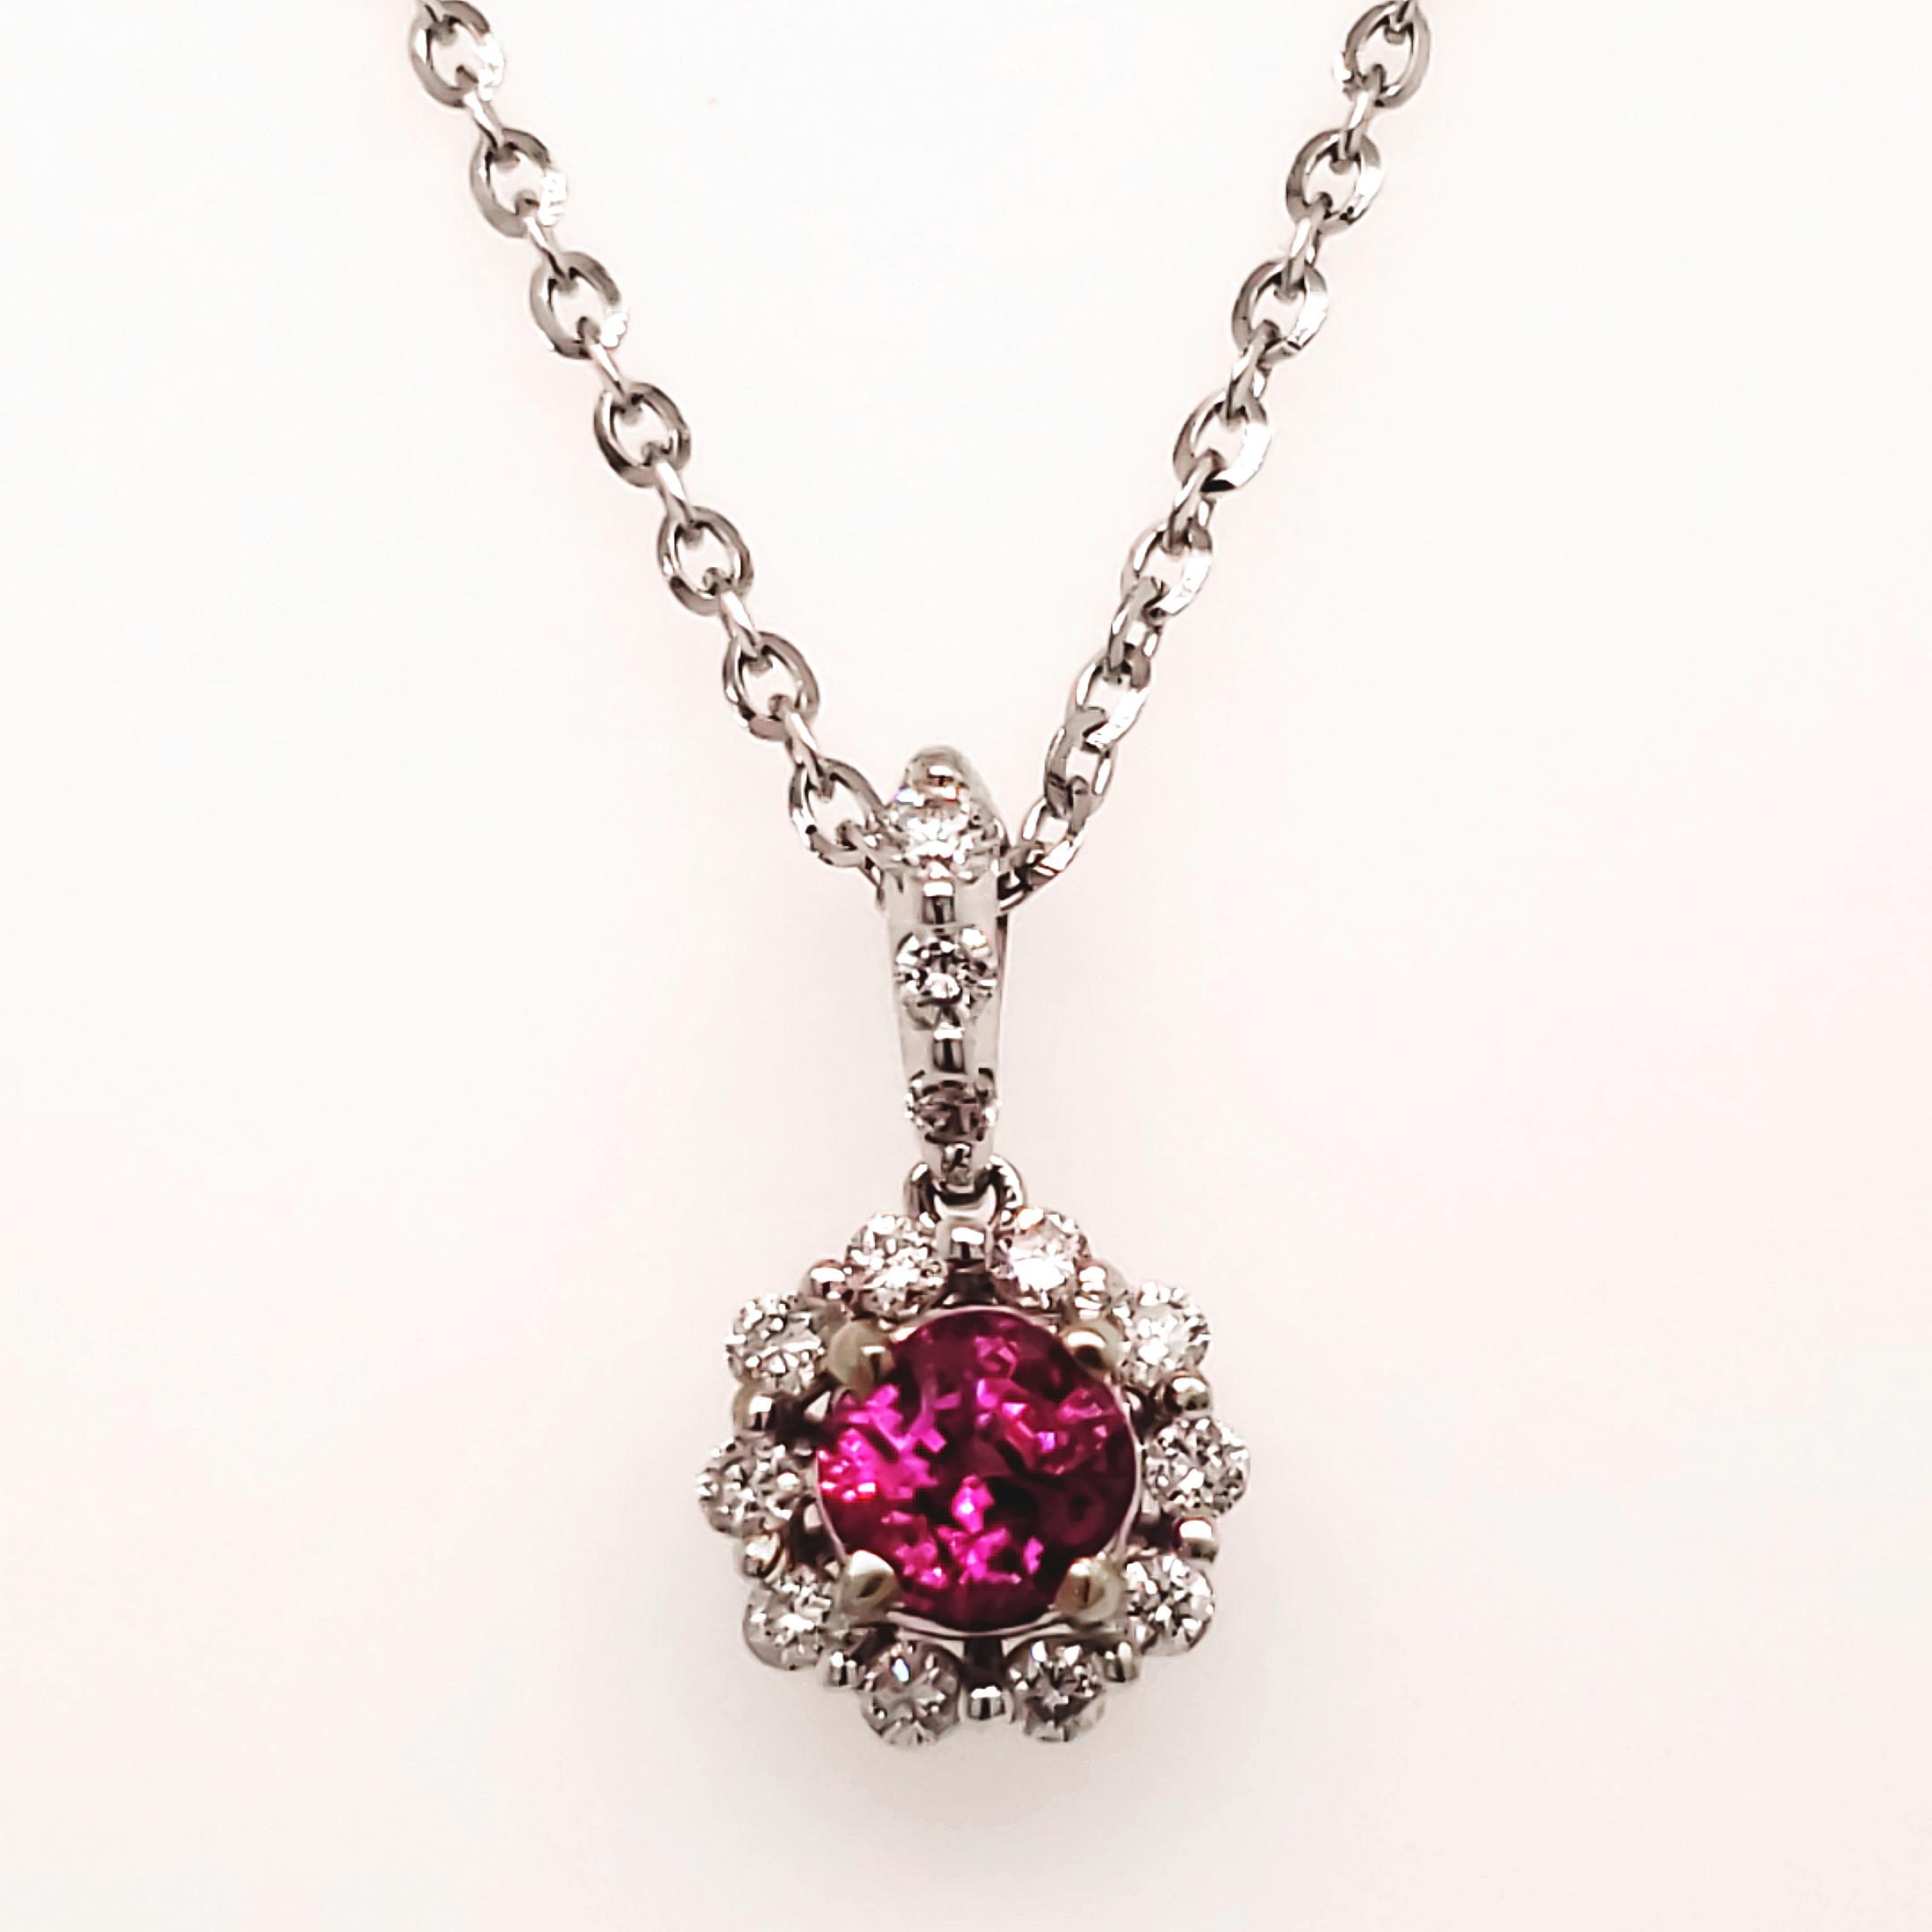 .85 ct. Ruby and Diamond Pendant